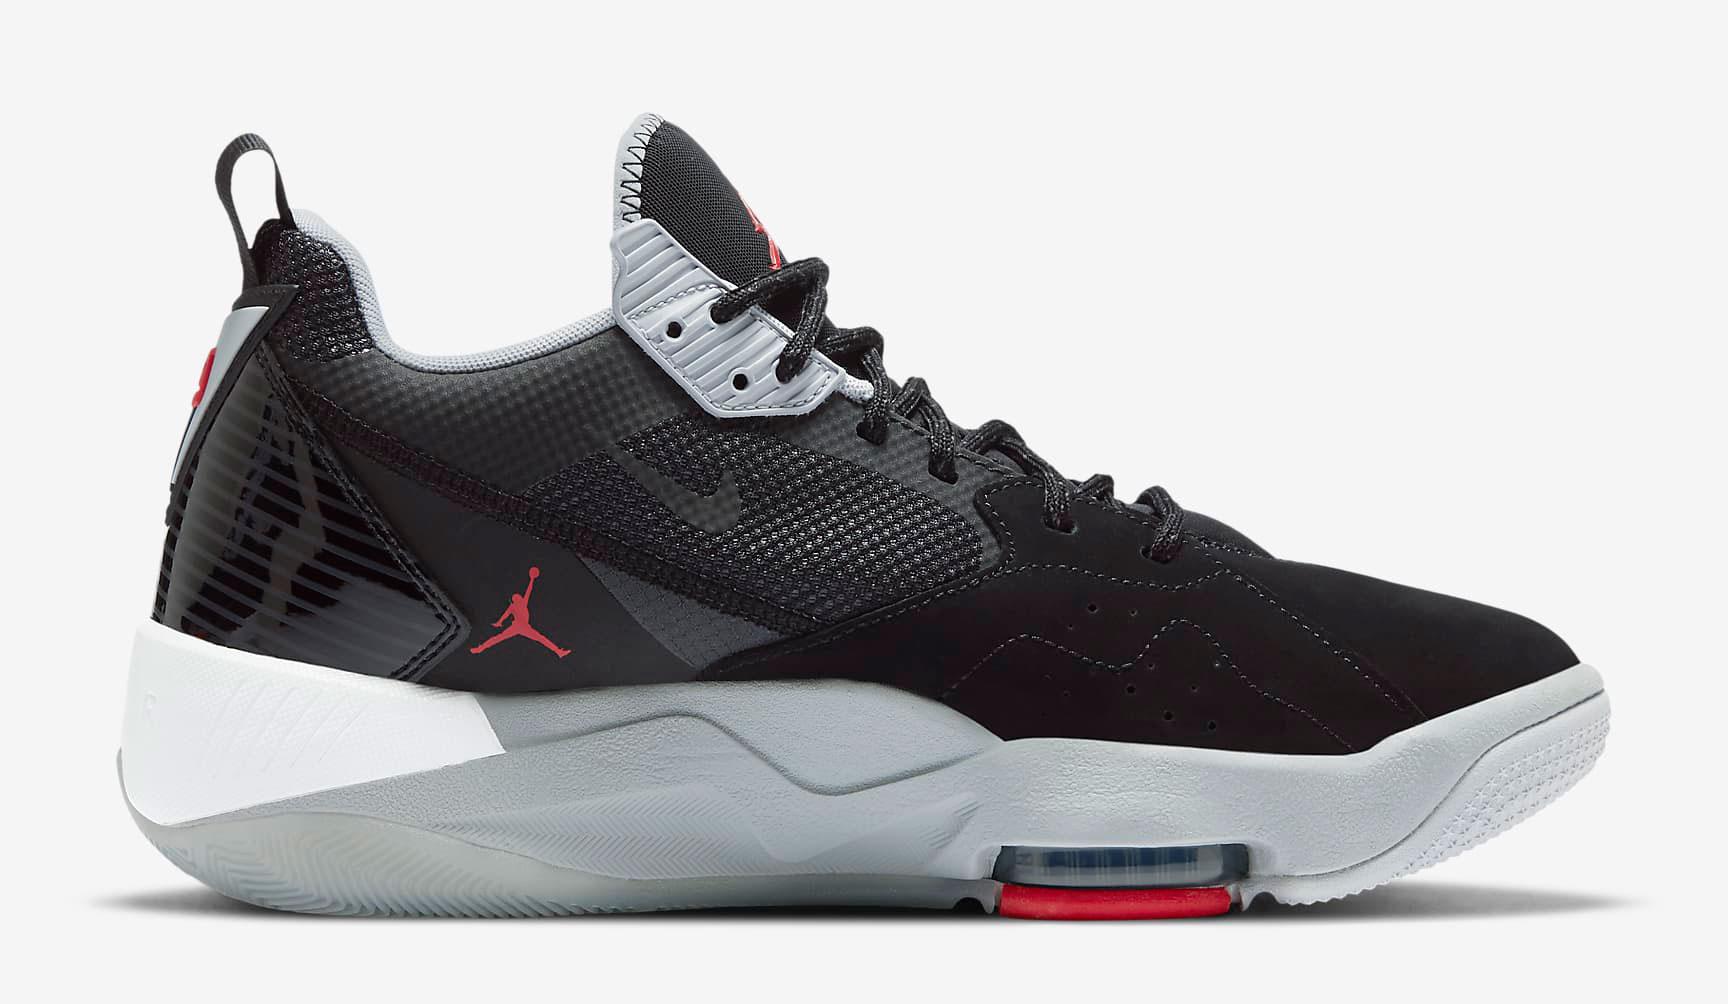 jordan-zoom-92-black-red-bred-cement-3